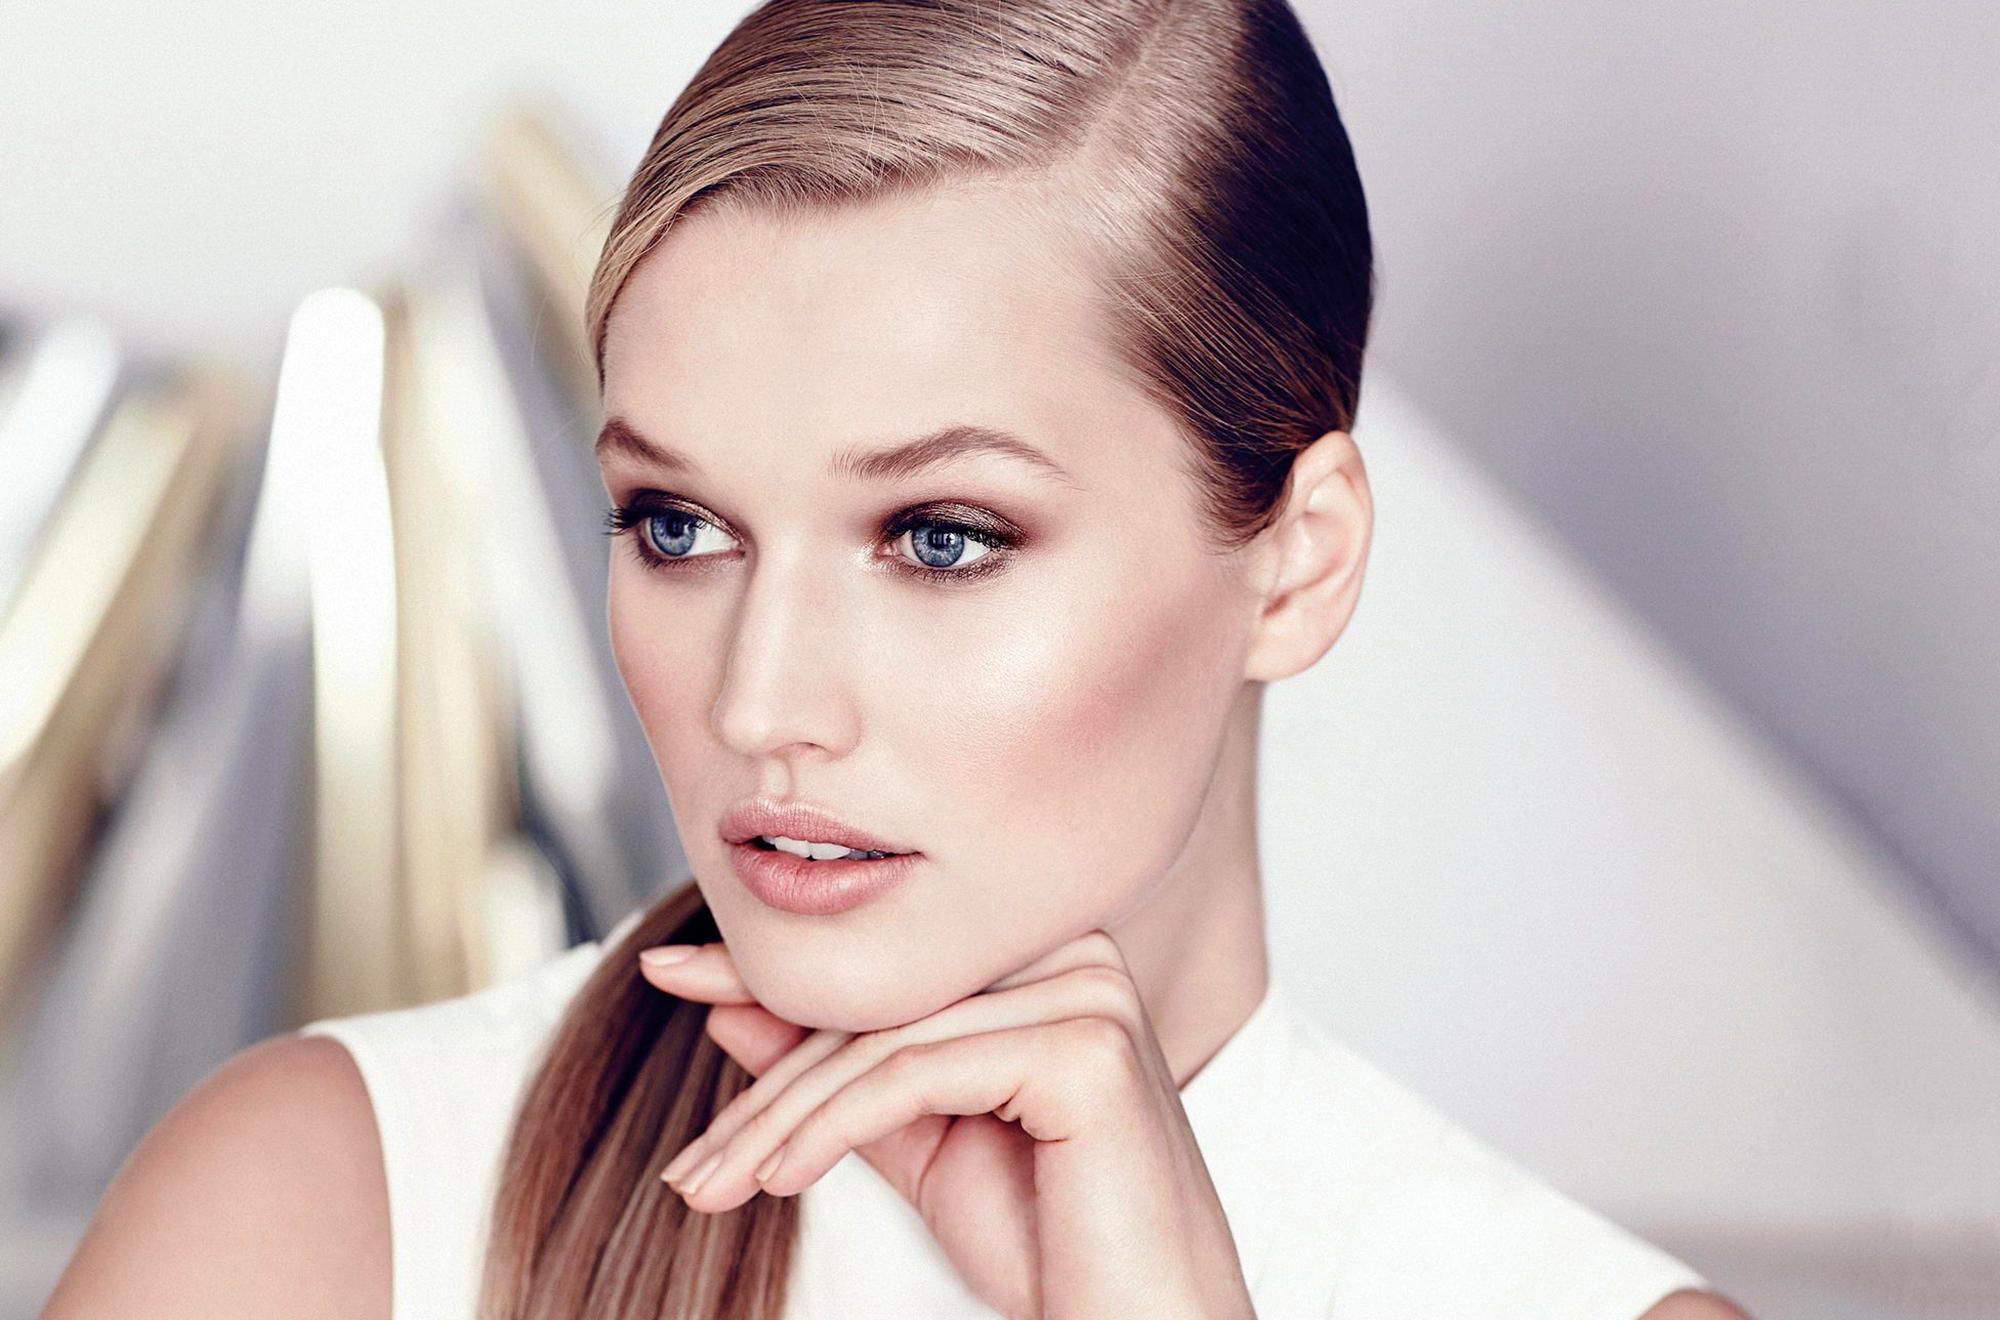 Hq 3d Wallpapers Free Download Hd Toni Garrn Model Girl Face Make Up Wallpaper